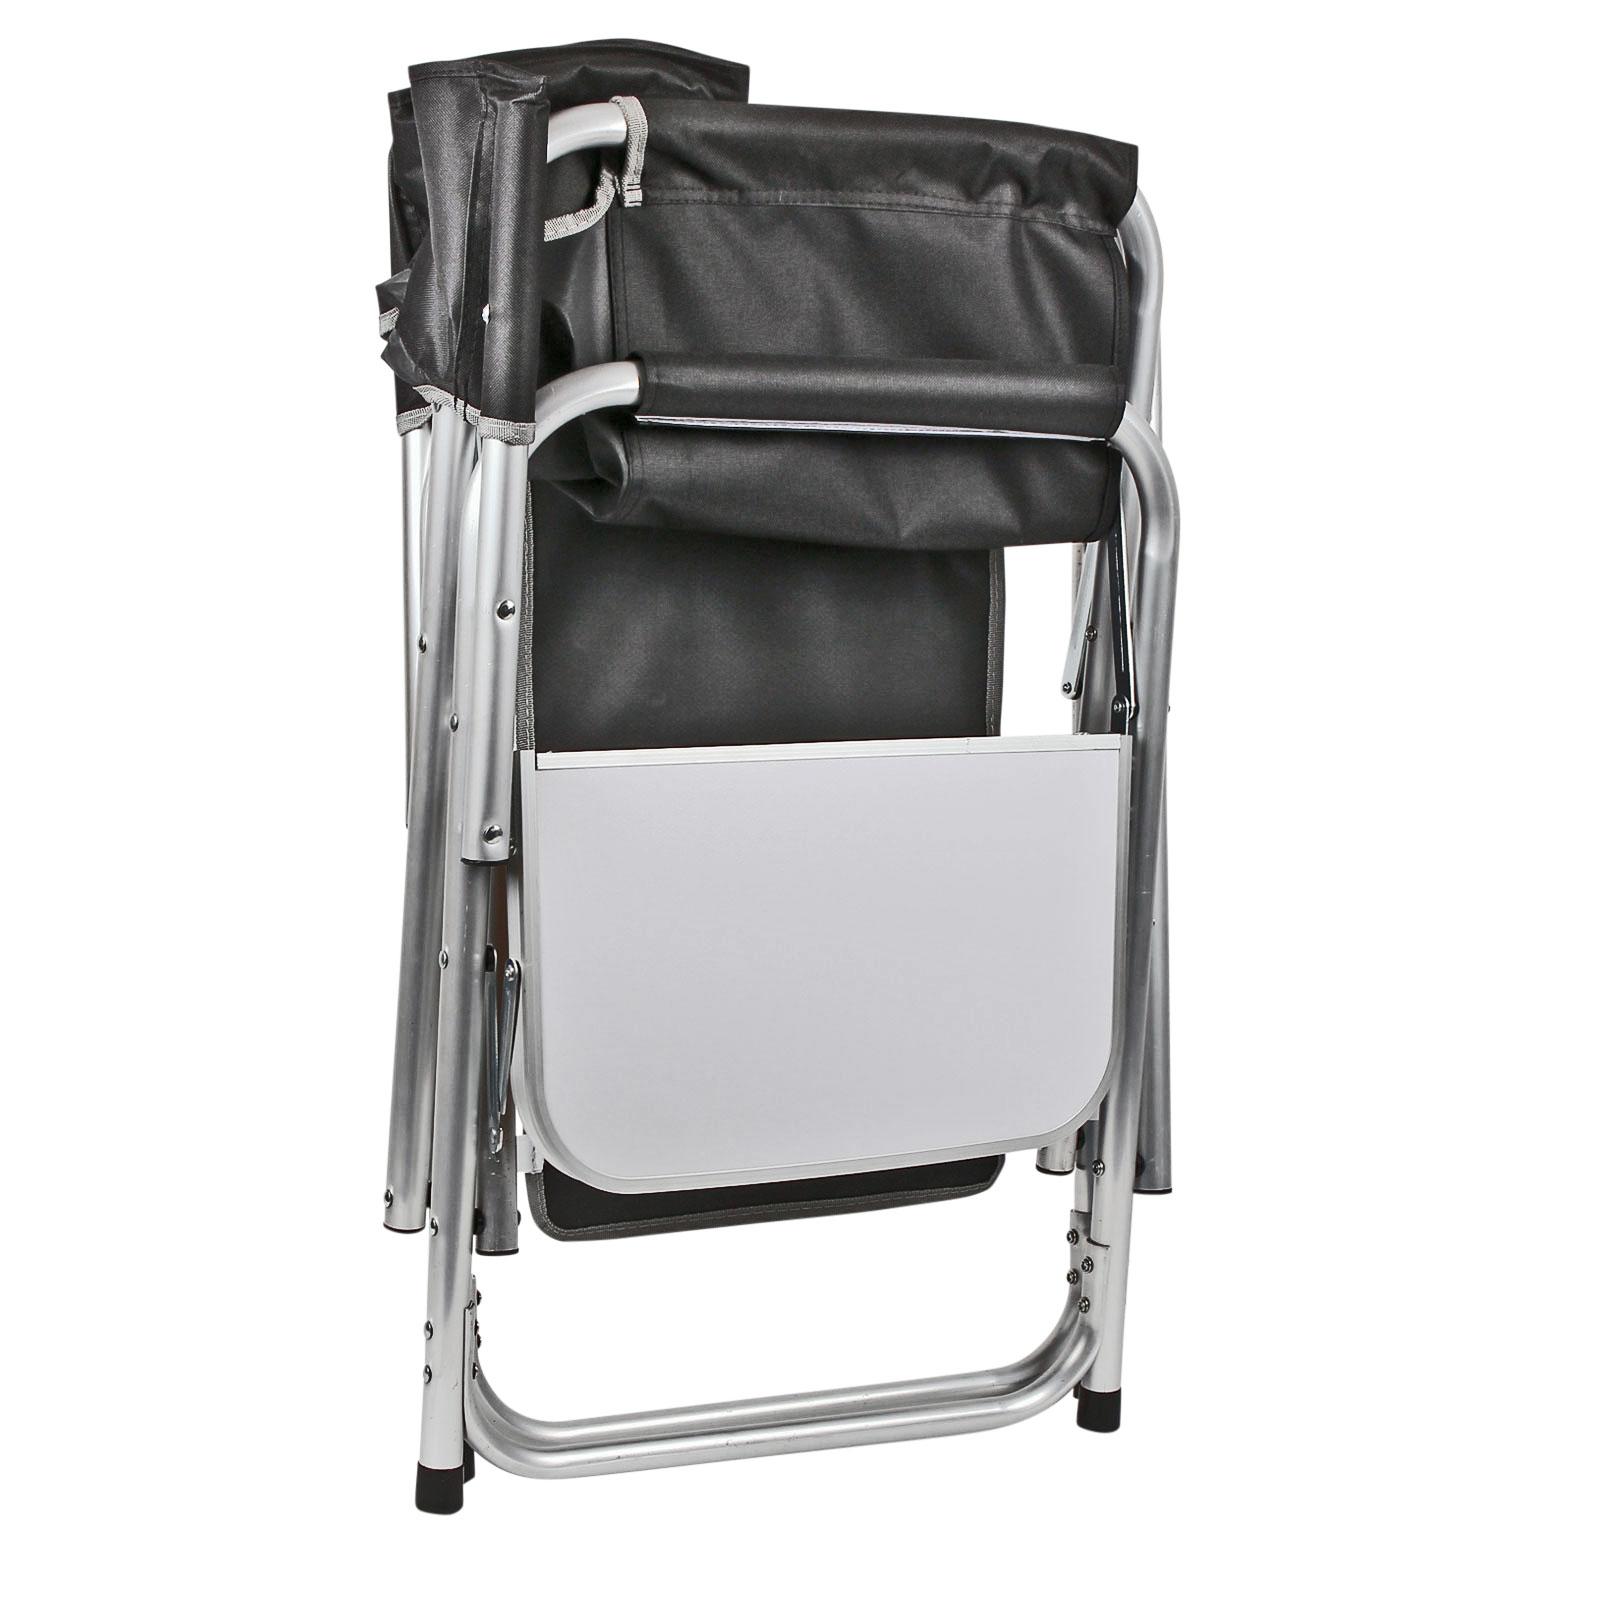 camping m bel set 1x tisch bali 2x campingstuhl klappbar mit ablage utensilo ebay. Black Bedroom Furniture Sets. Home Design Ideas